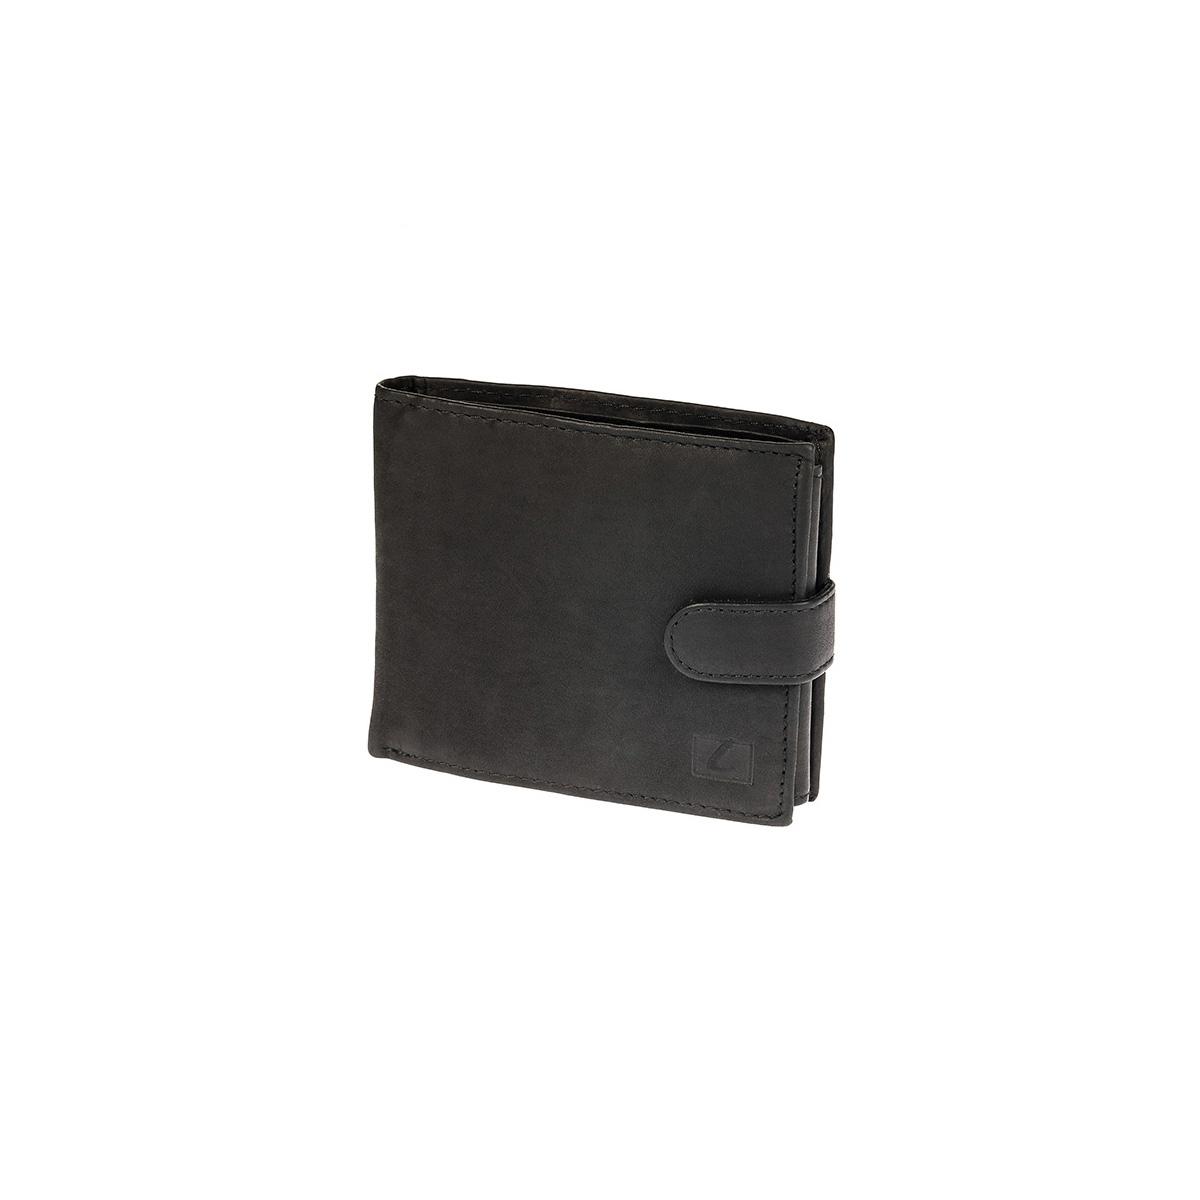 e8a4f64be1 Δερμάτινο Πορτοφόλι Μικρό Με Κούμπωμα Lavor RFID 7128 Μαύρο